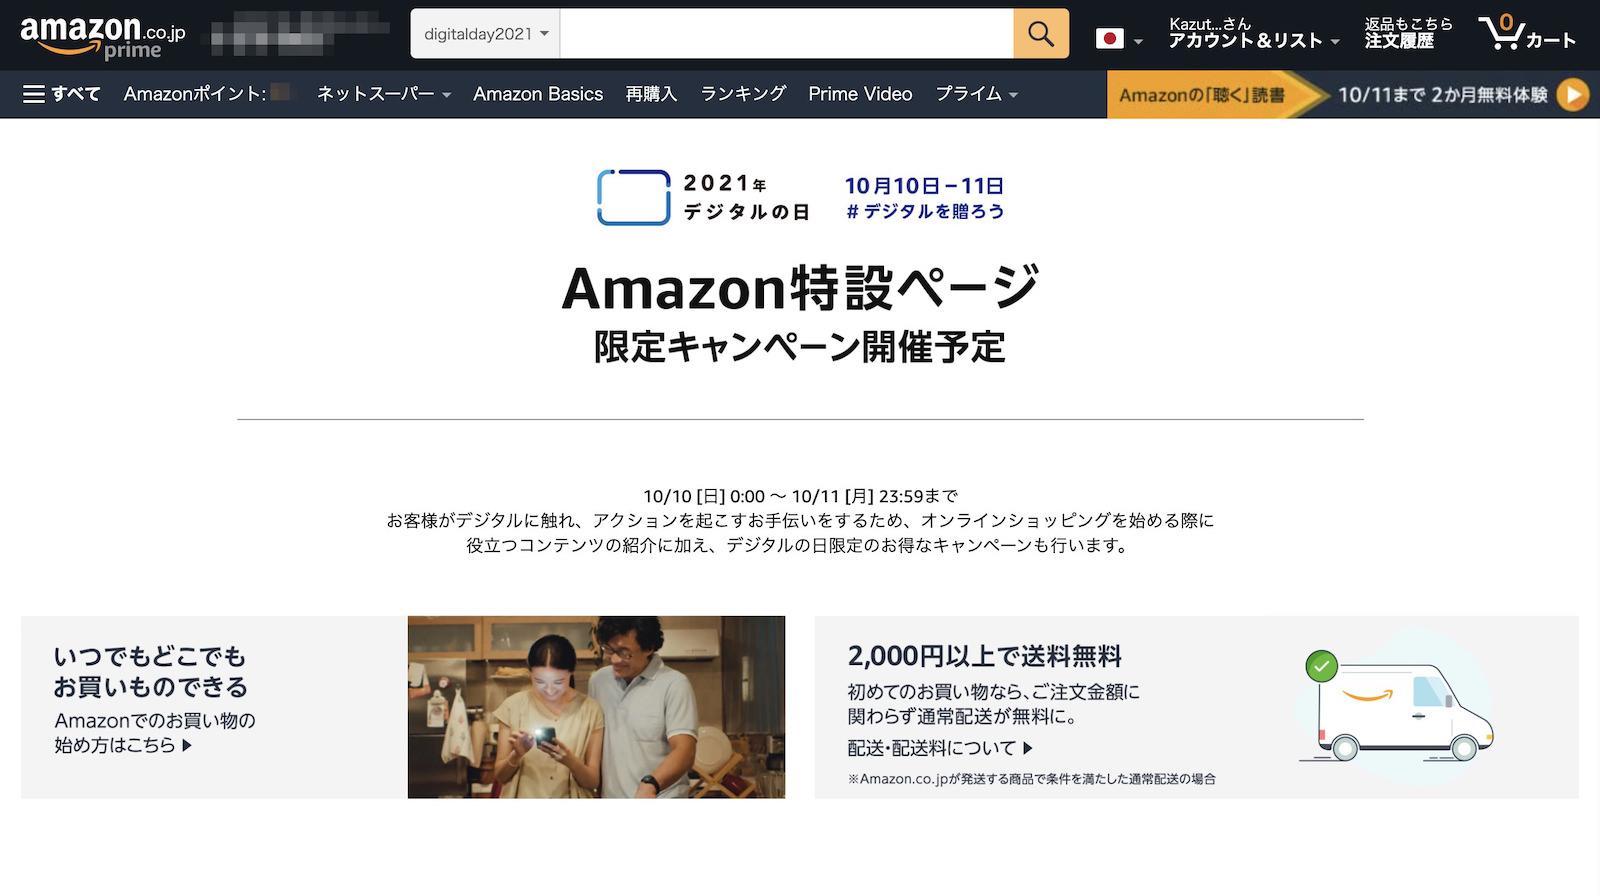 Amazon digital Day Capture